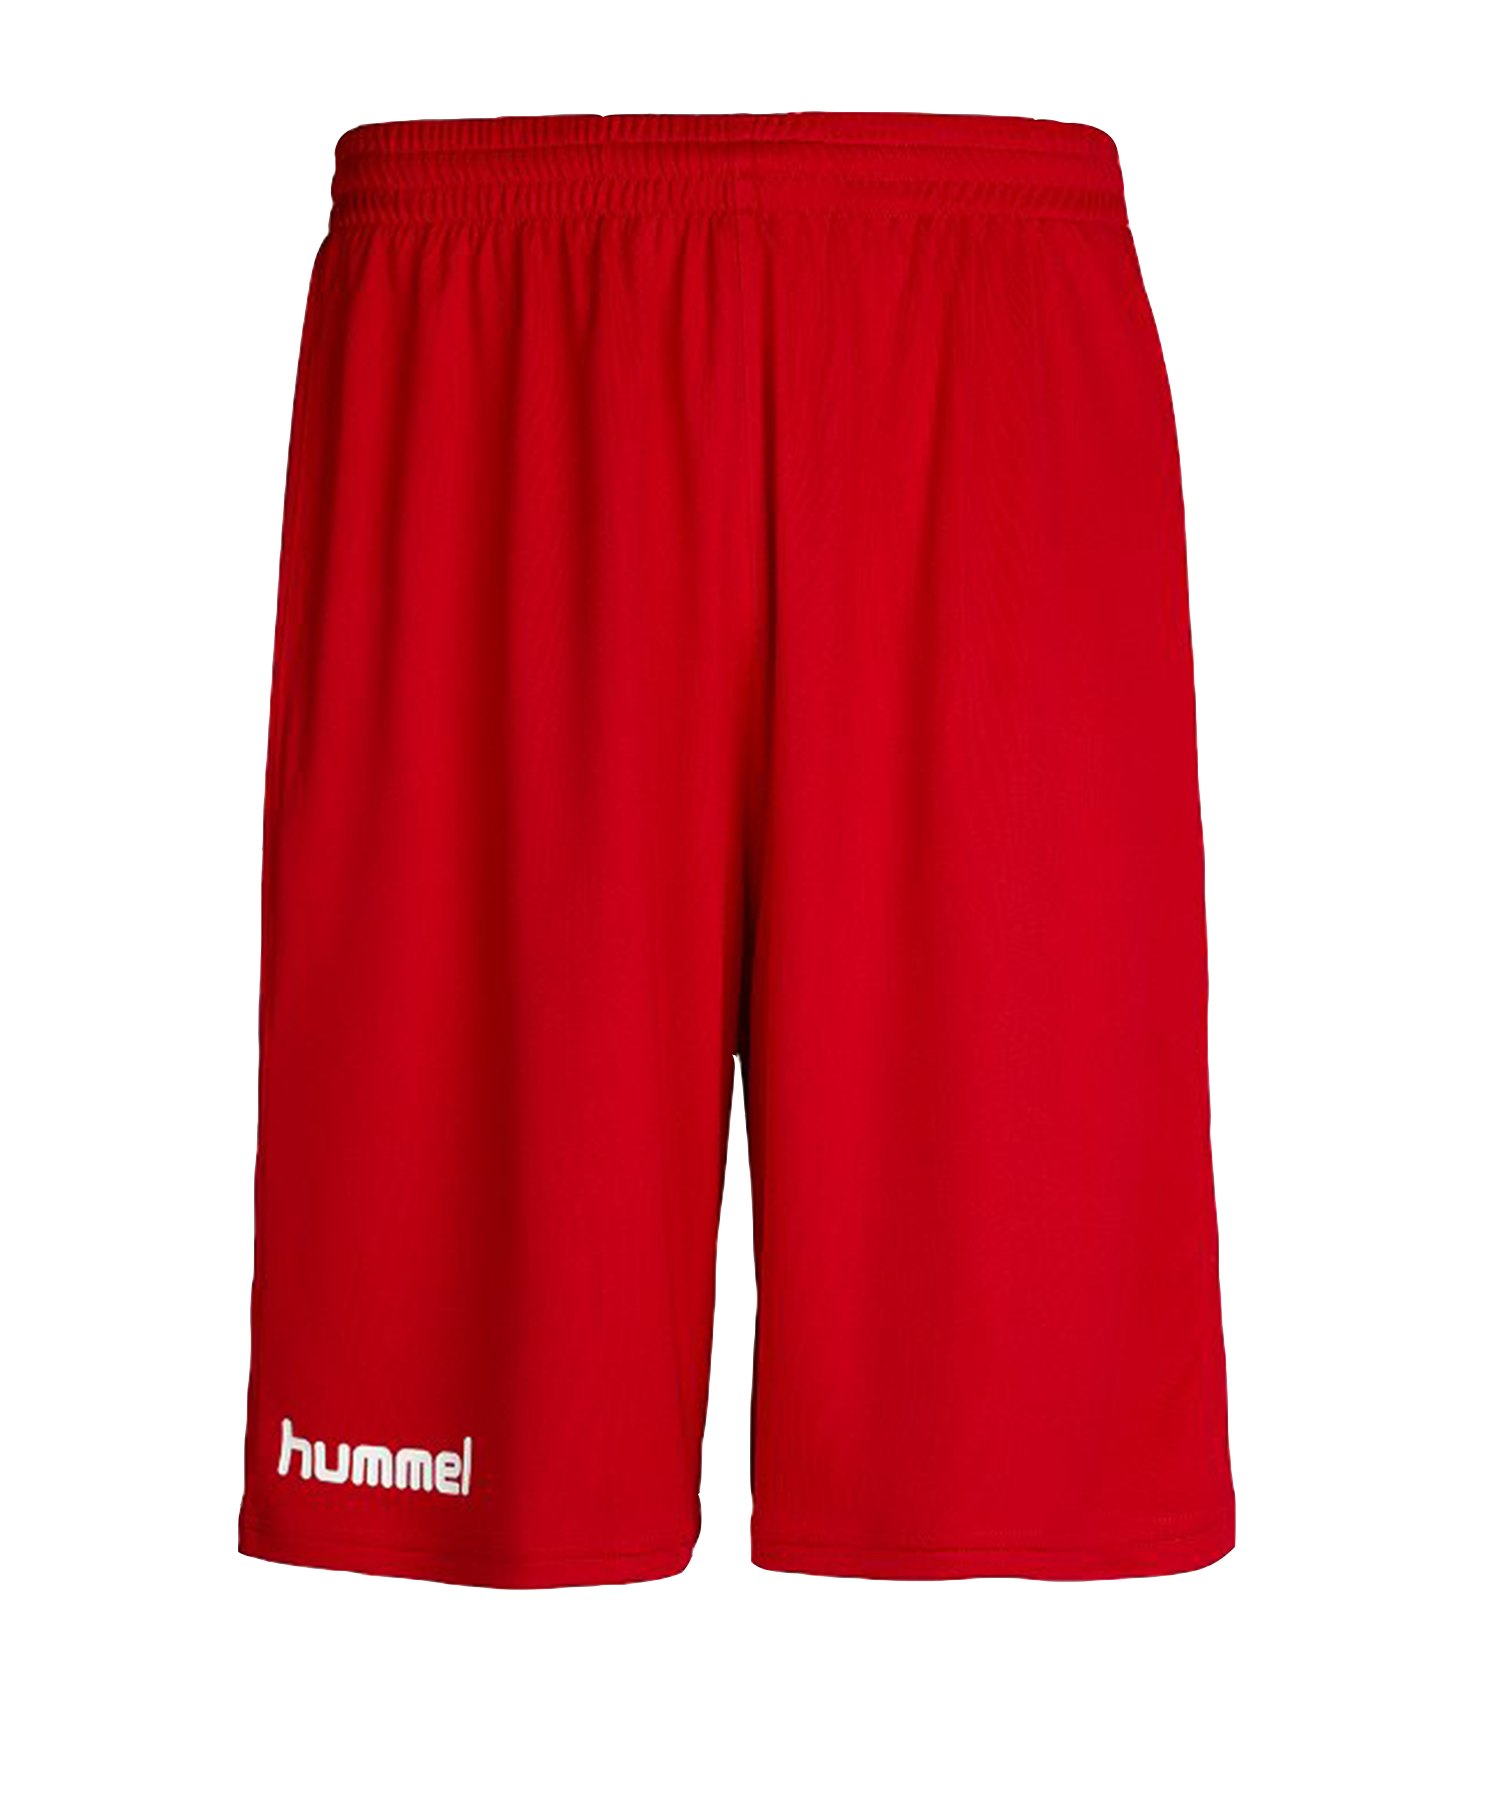 Hummel Core Basket Short Rot F3062 - rot